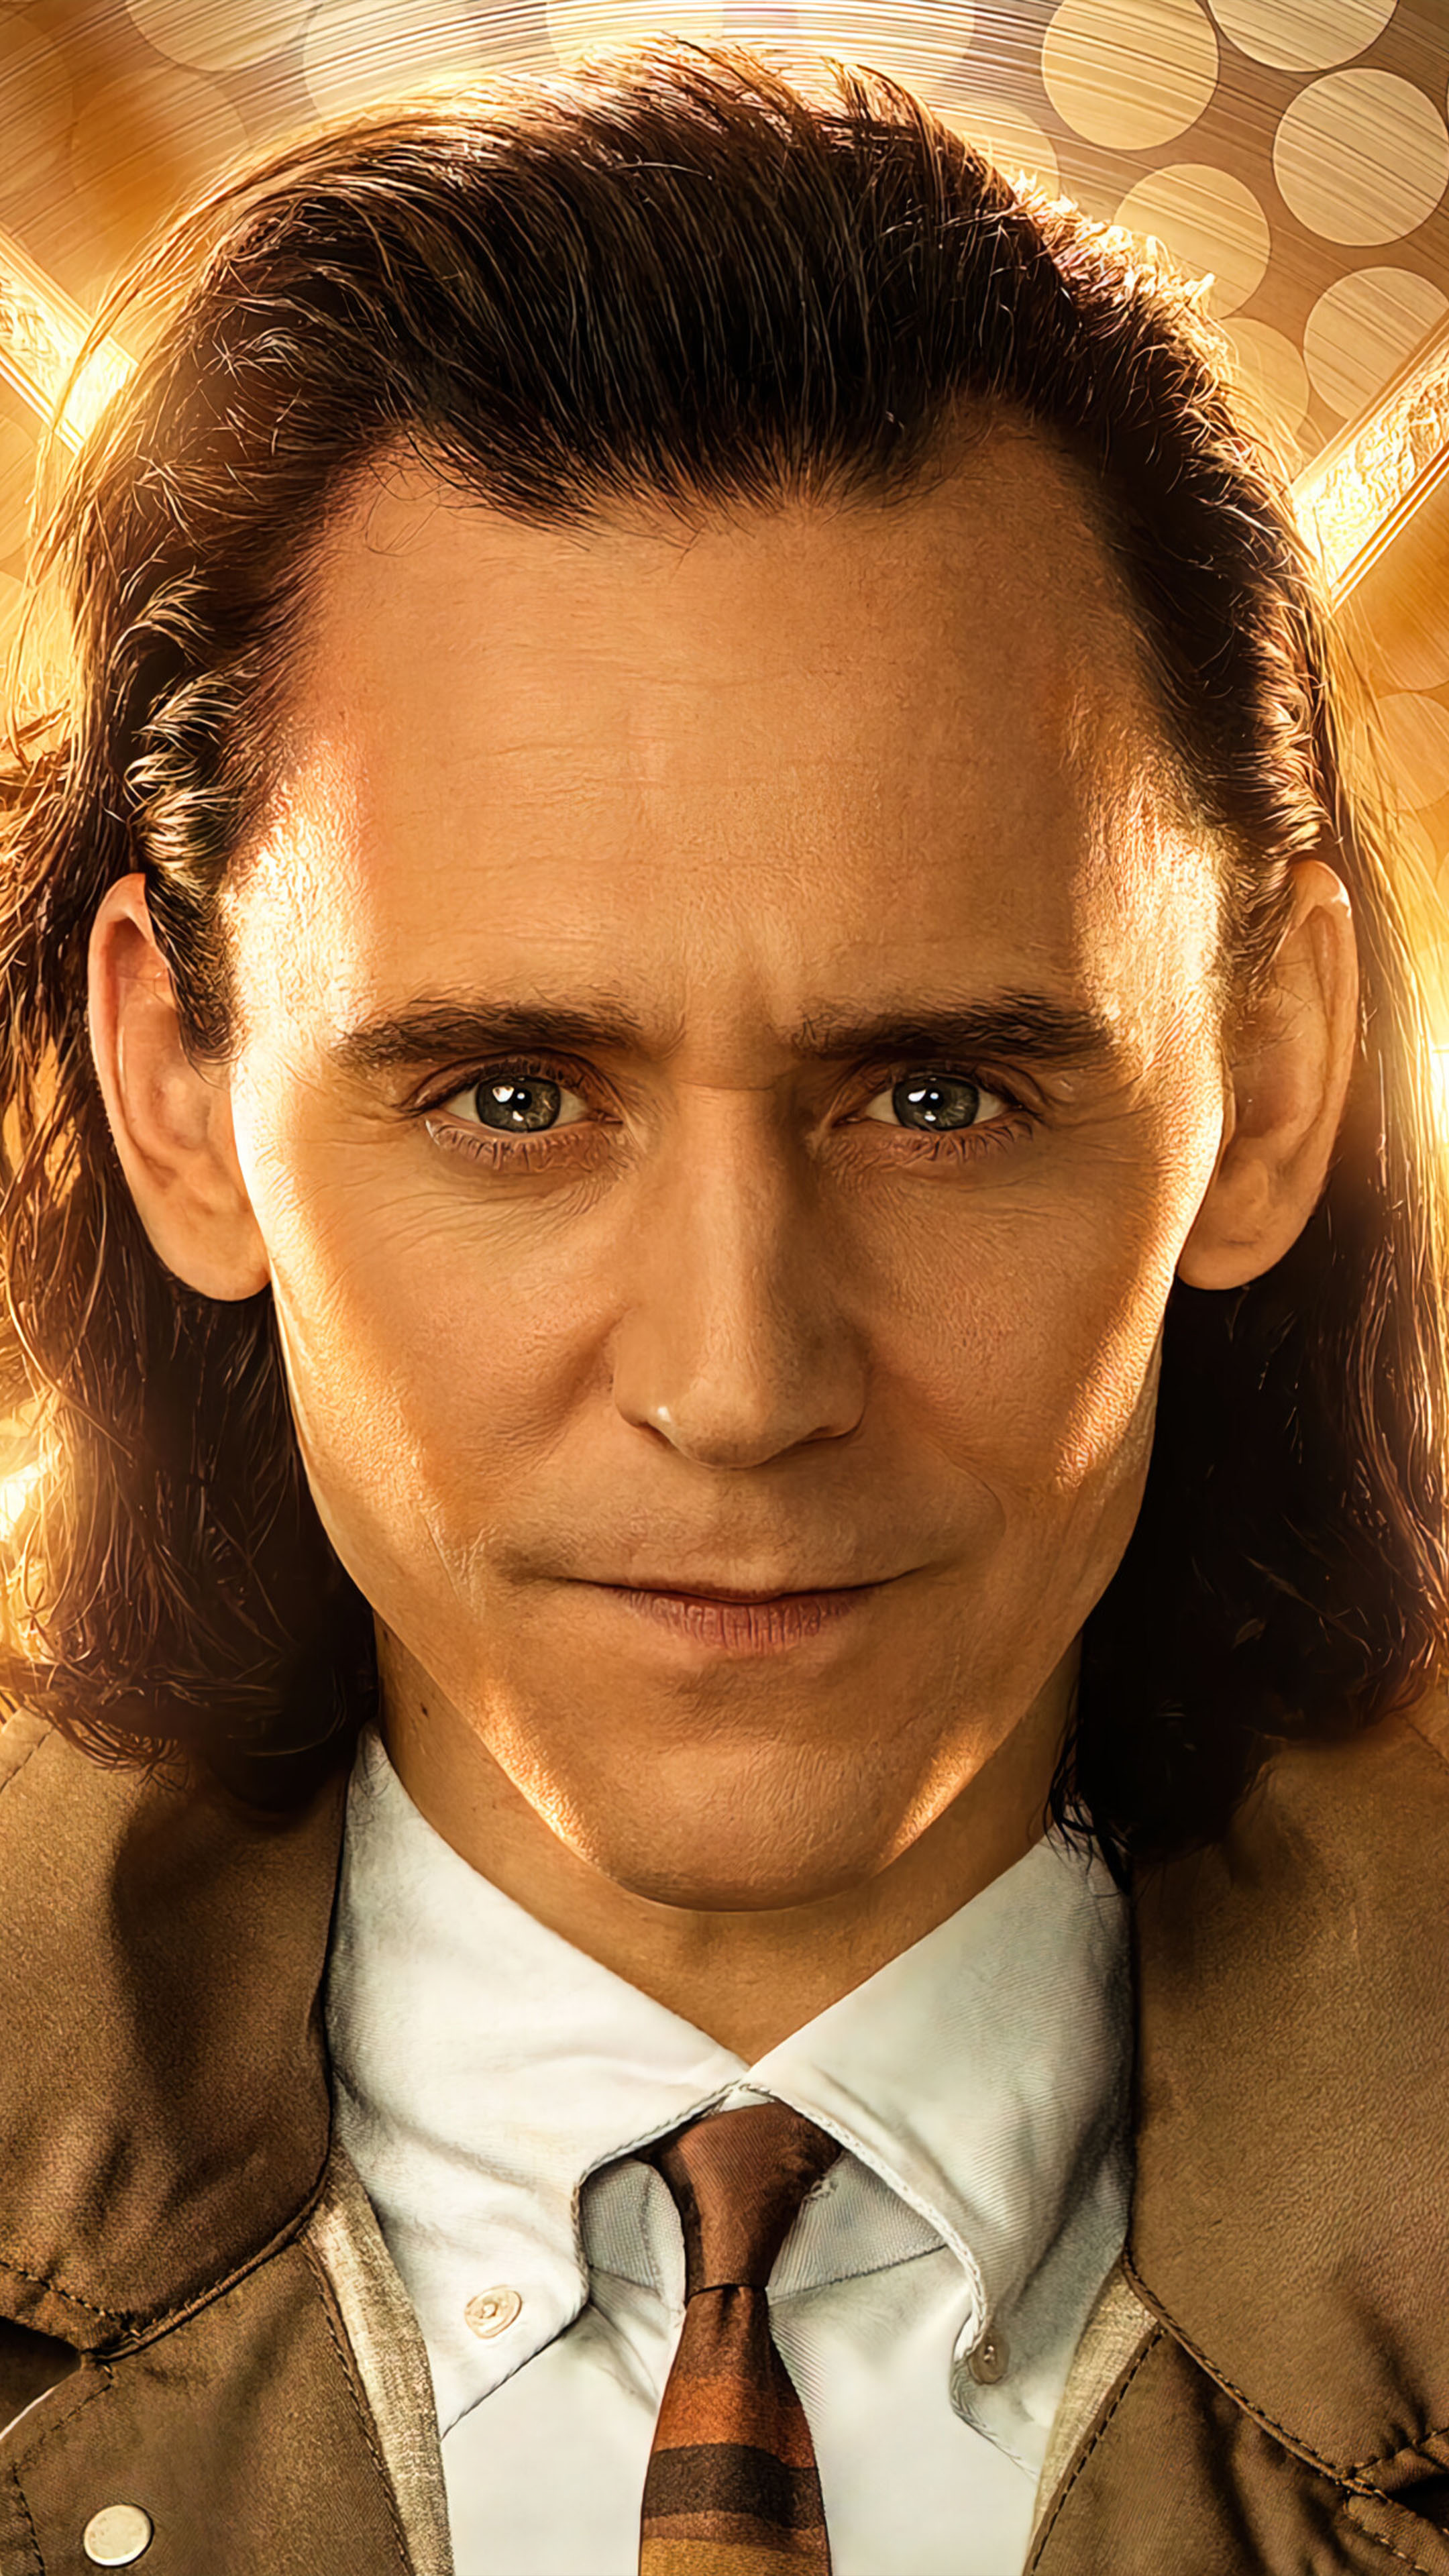 Tom Hiddleston In Loki Series 4K Ultra HD Mobile Wallpaper 2160x3840